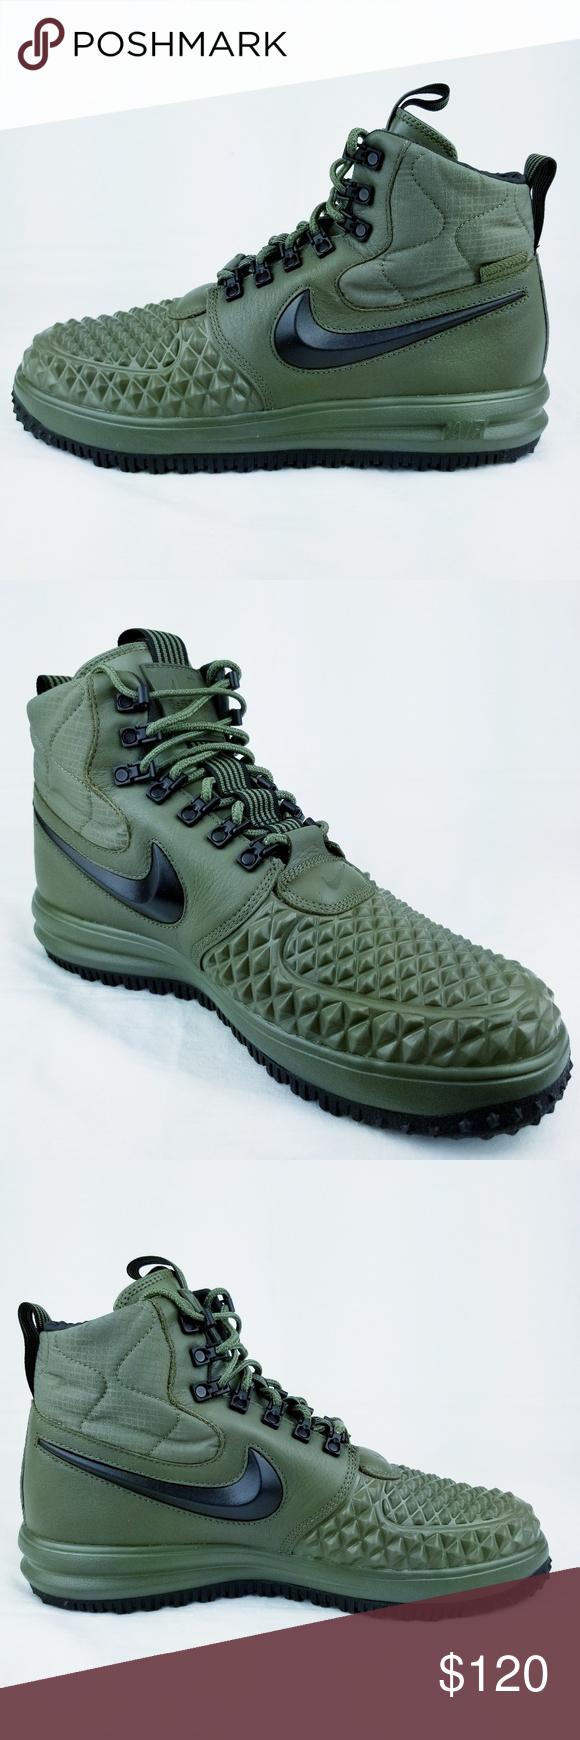 04a7ed35a282 Nike LF1 Lunar Force 1 Duckboot 17 Men Shoe Sz10.5 NIKE LF1 Lunar Force